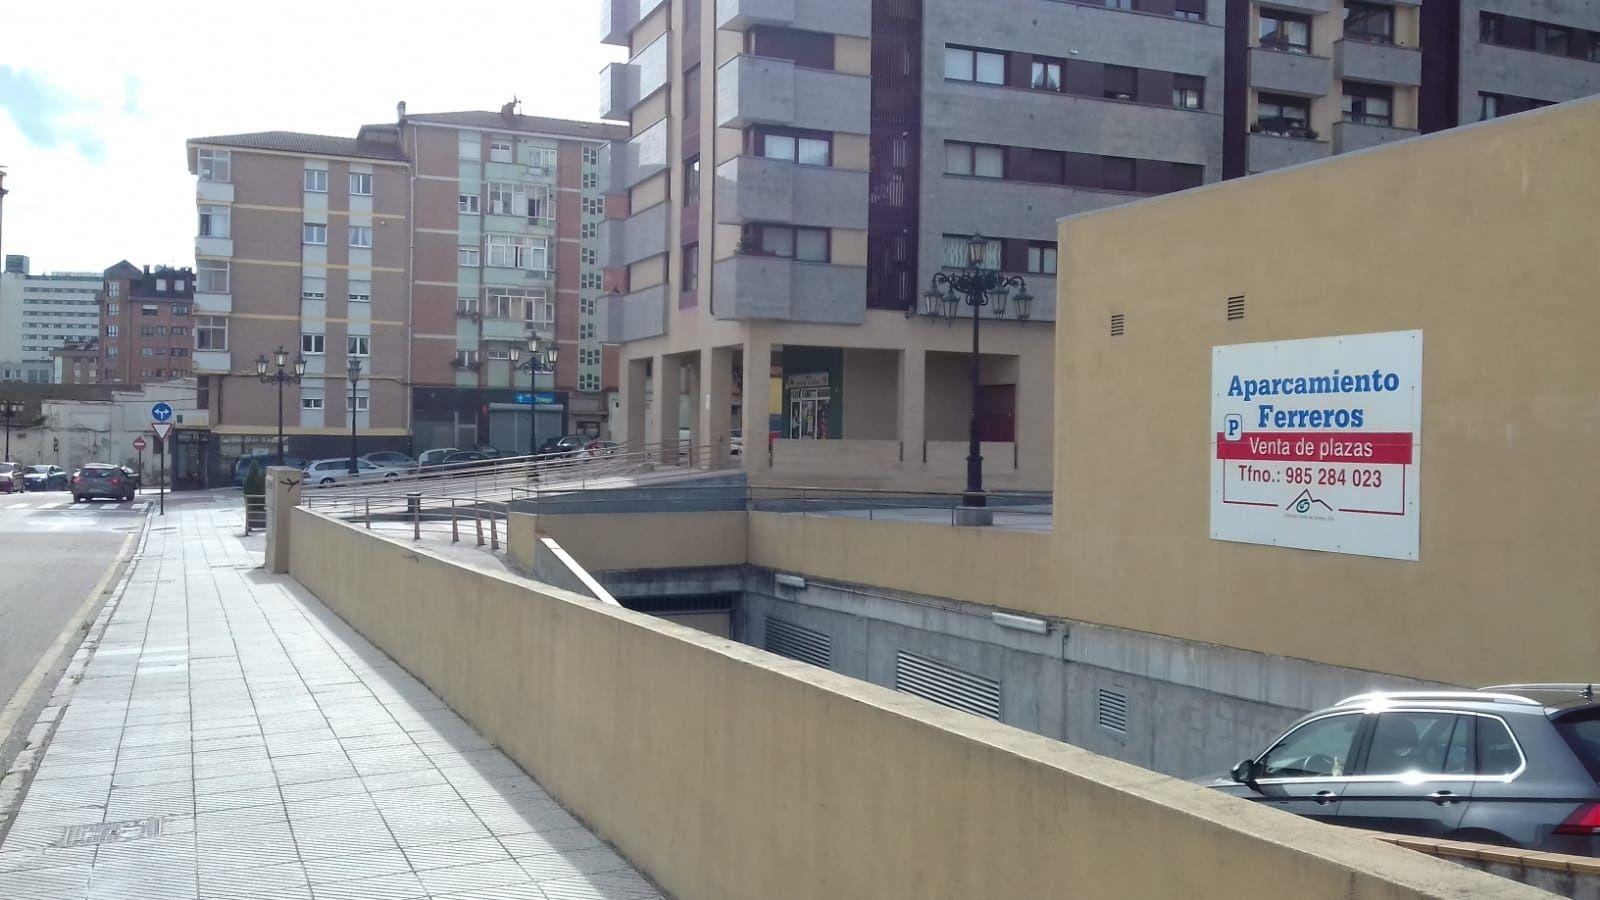 Saul Berjon Real Oviedo Rayo Majadahonda Wanda Metropolitano.Parking de los Ferreros en Ciudad Naranco, Oviedo